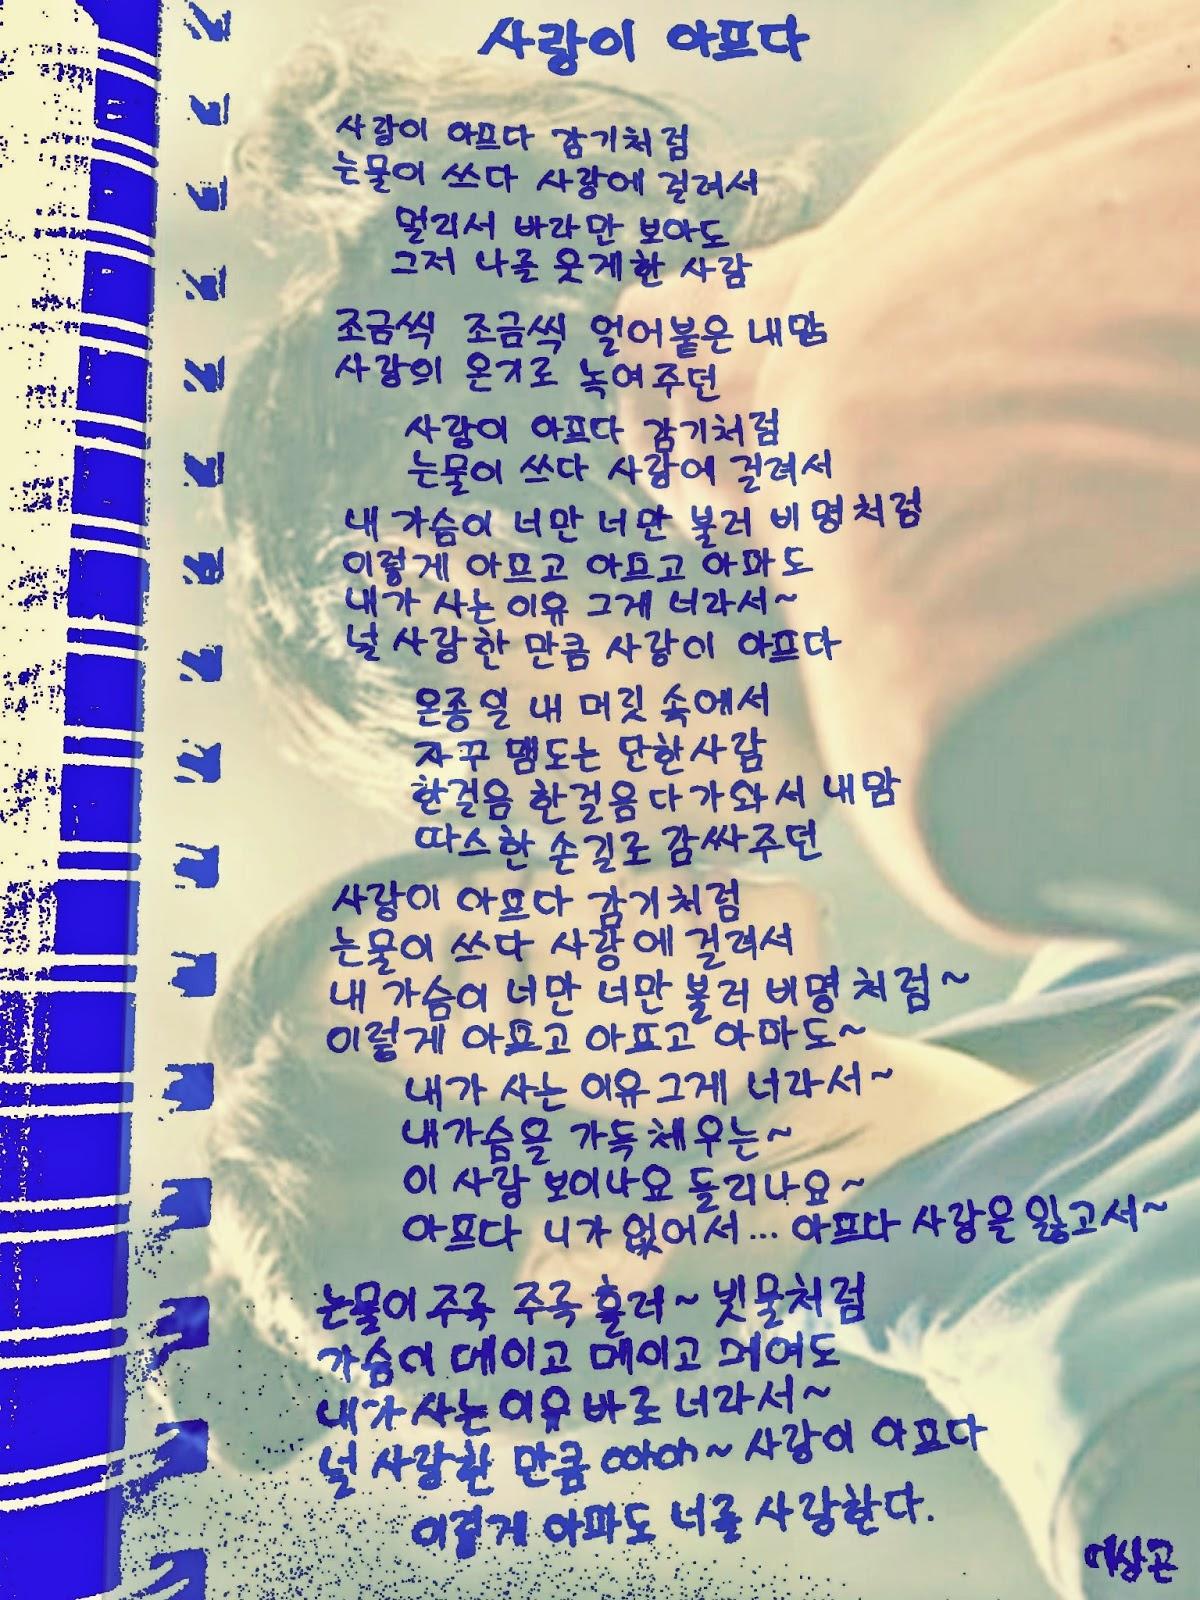 K-drama Gu Family Book (구가의 서) OST | meheartsoul.blogspot.com